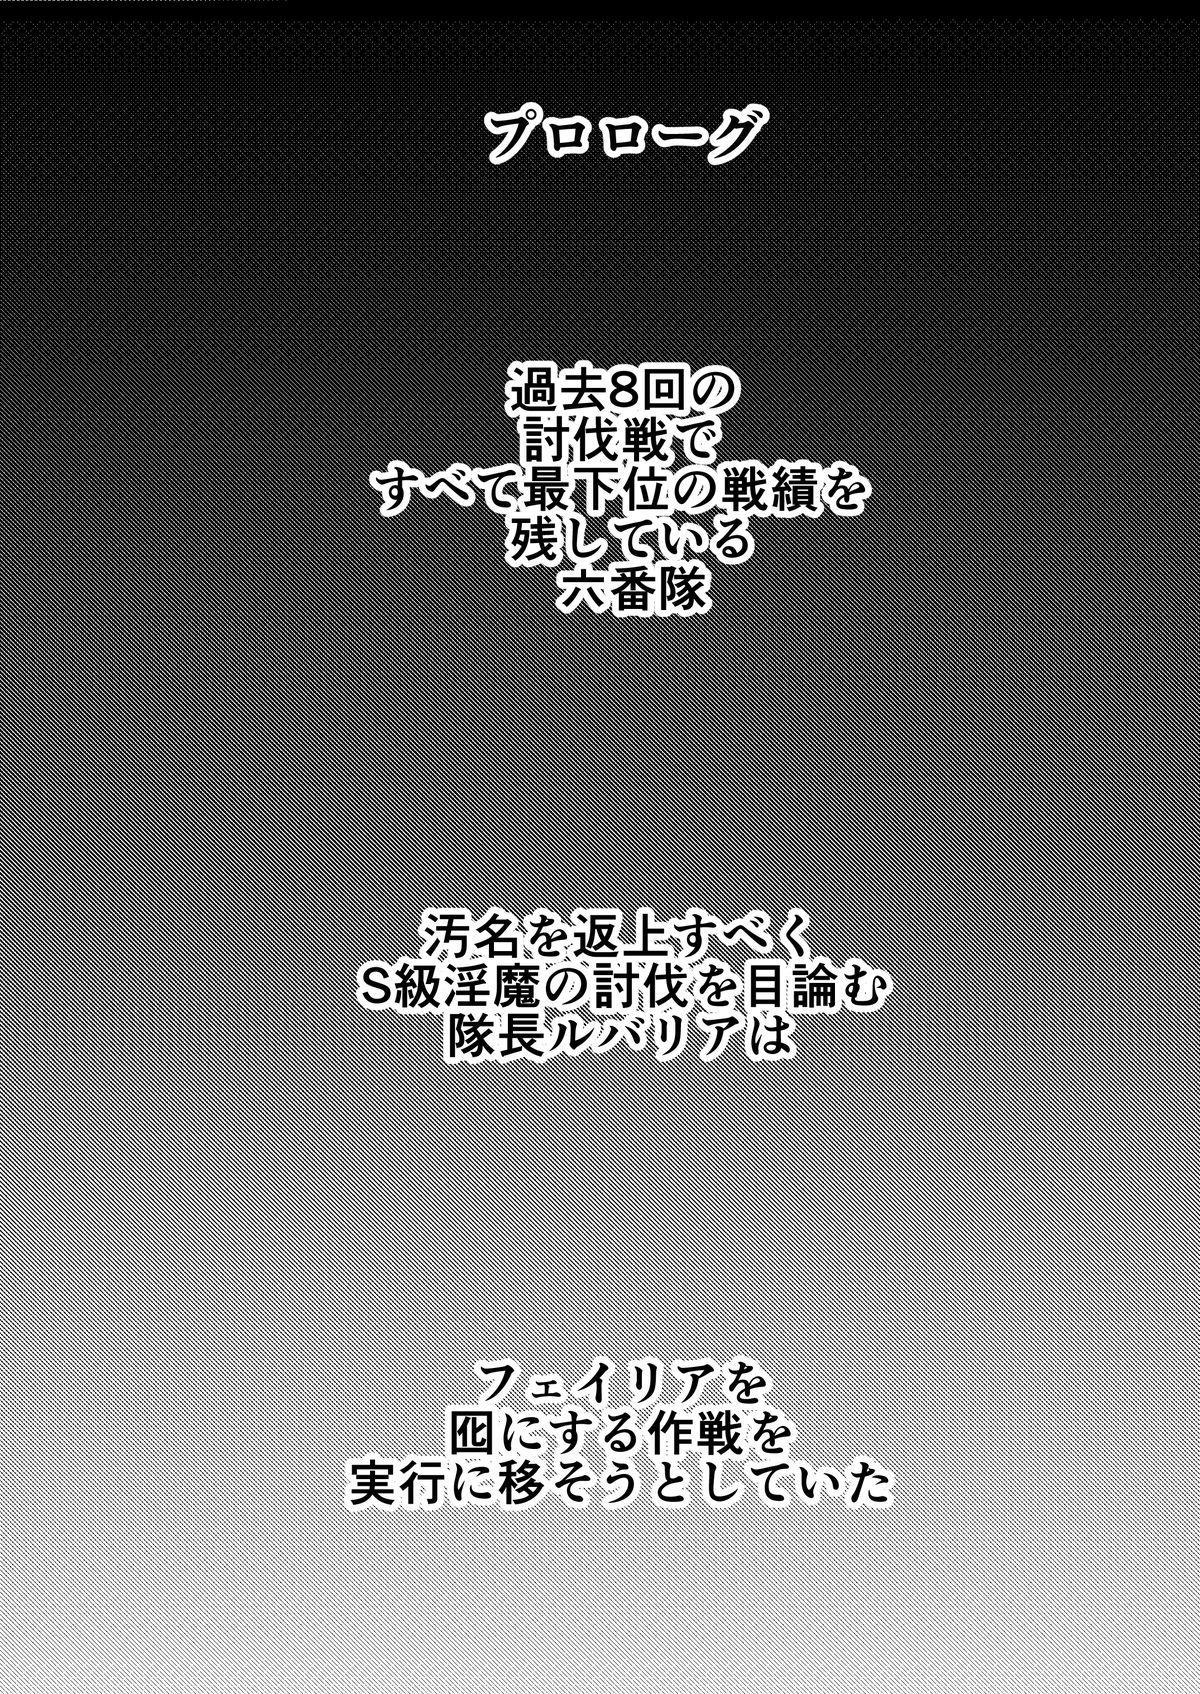 Inma Toubatsu Daisakusen Episode 3 2